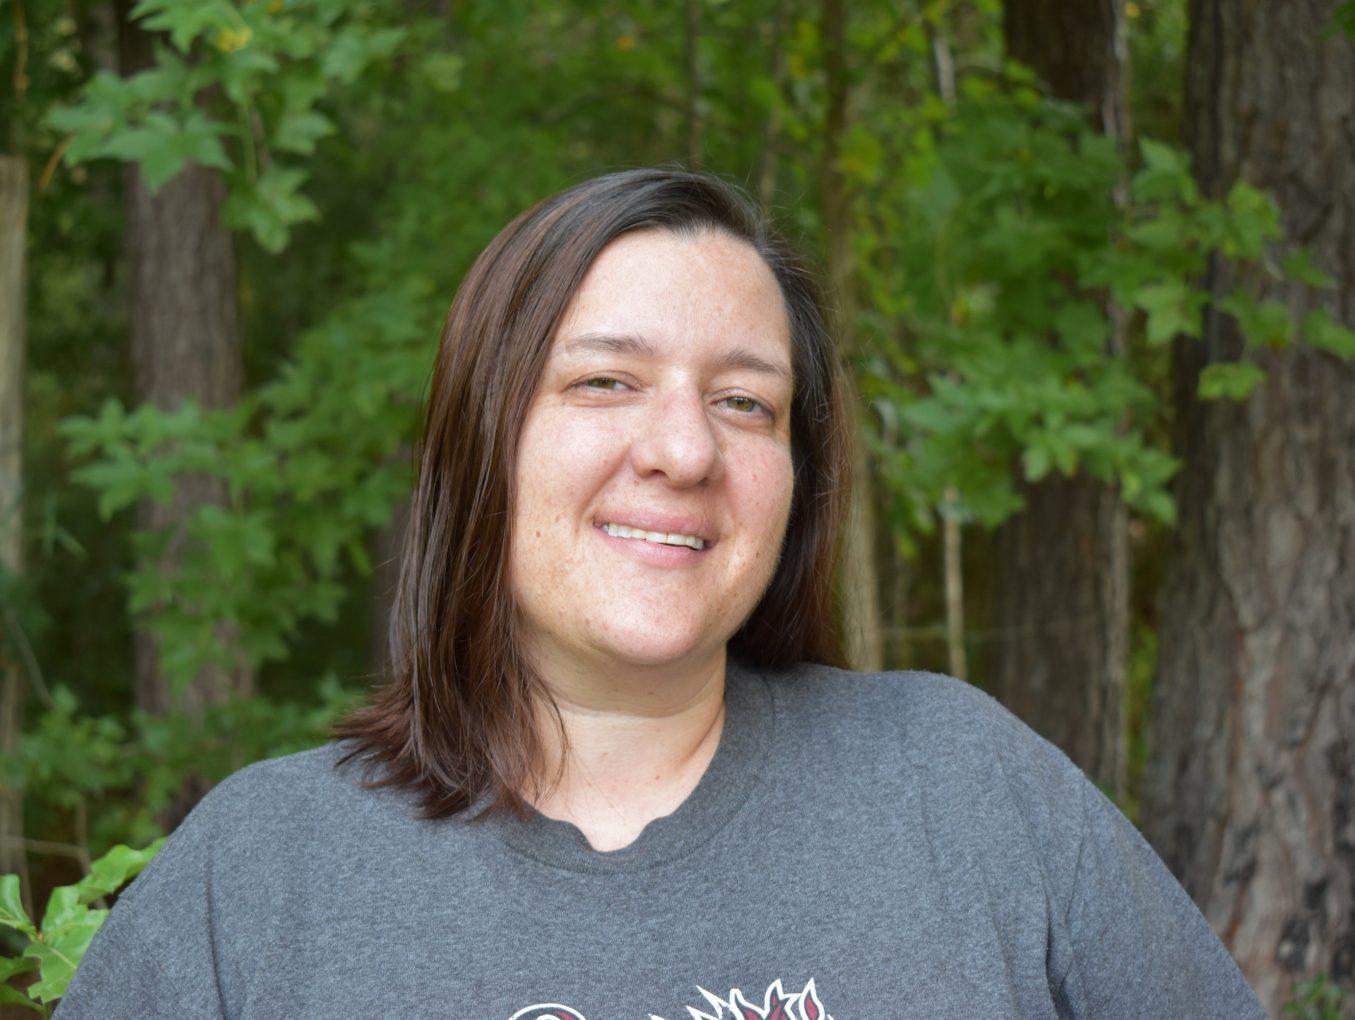 Cathyrne Crawford's Testimony